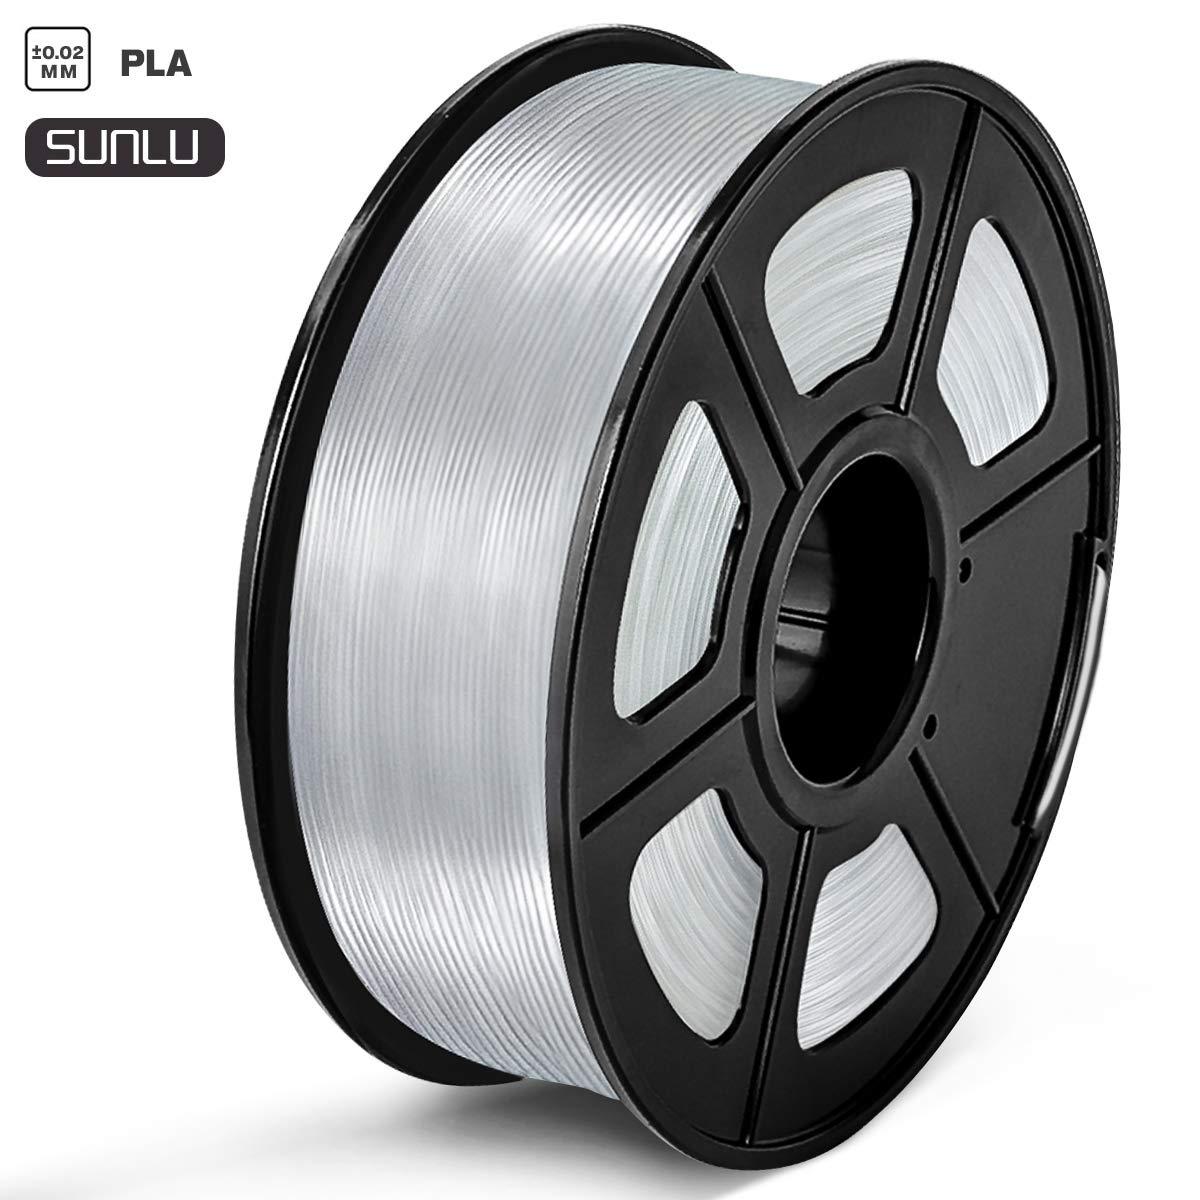 SUNLU PLA Filament 1.75mm 3D Printer Filament PLA Tangle-Free 1kg Spool (2.2lbs), Dimensional Accuracy of +/- 0.02mm PLA Transparent